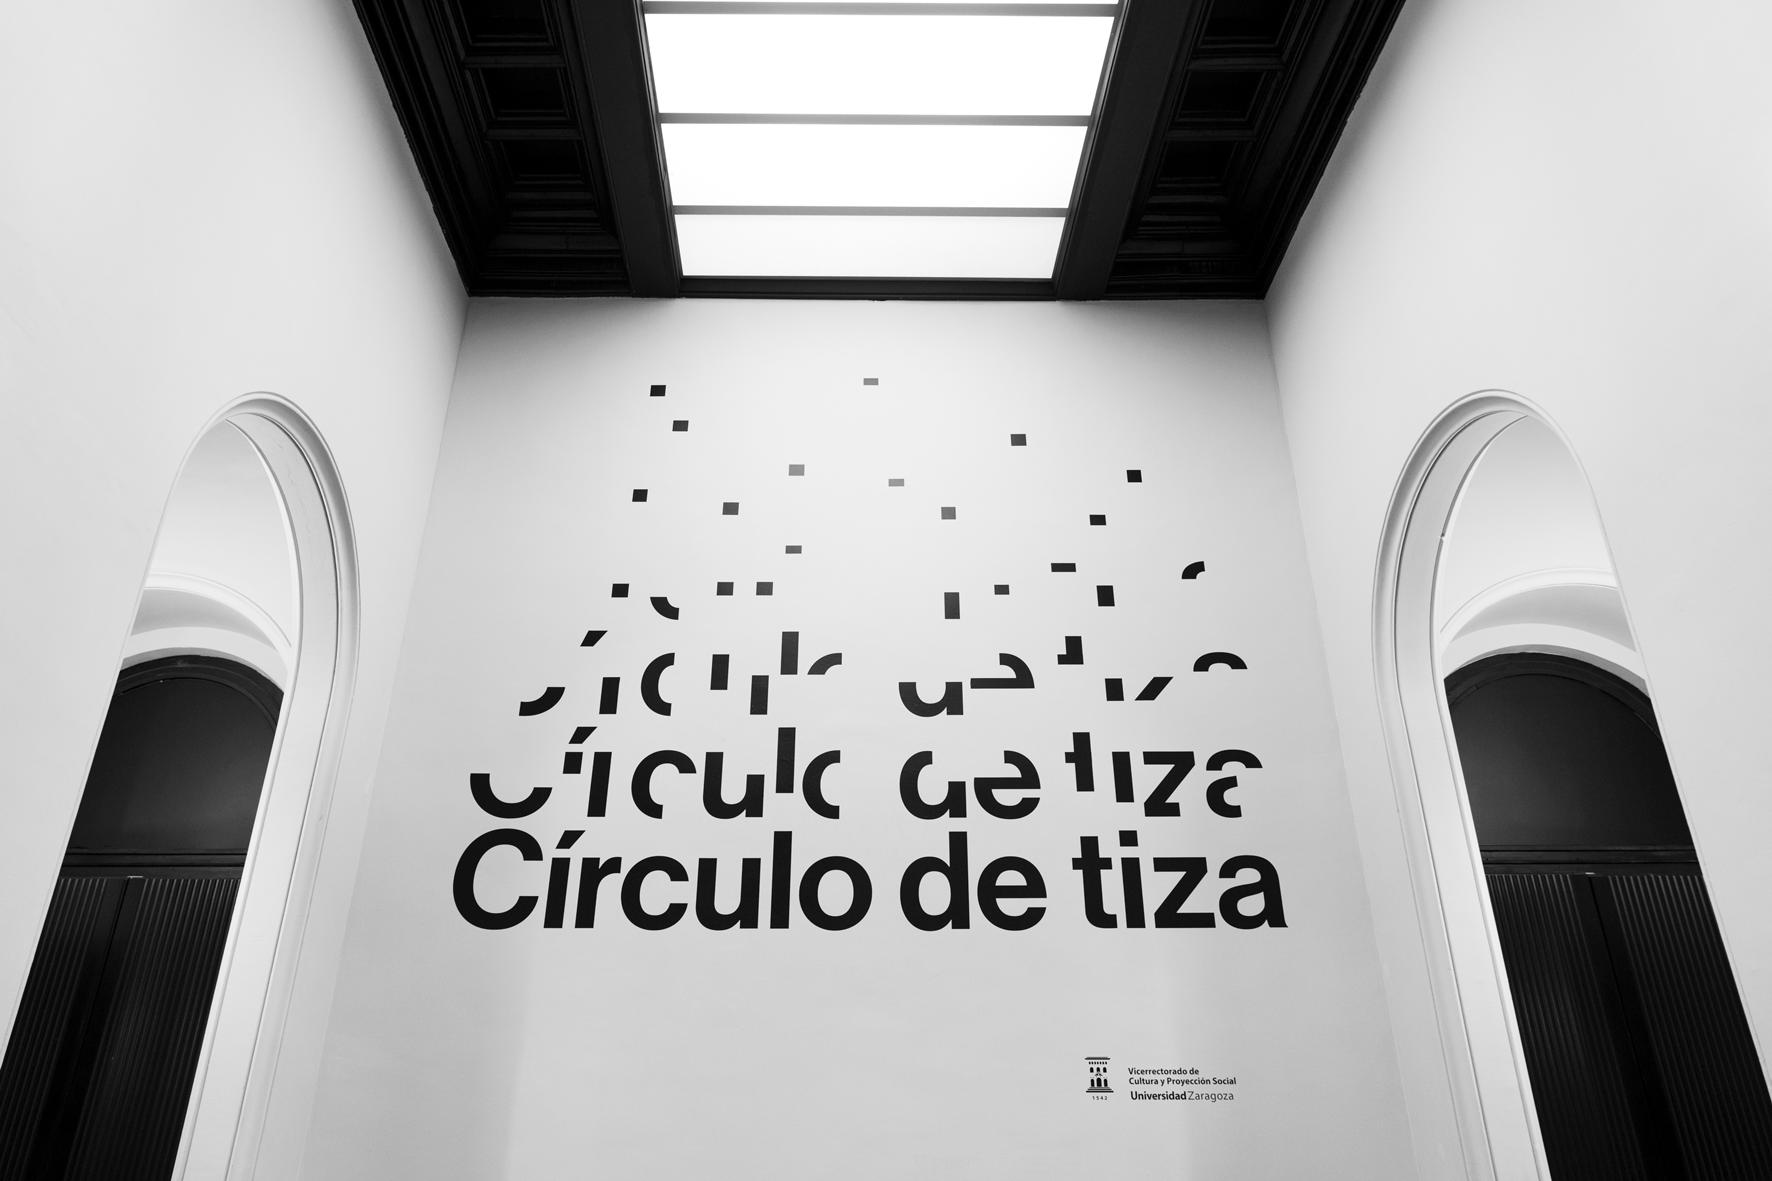 Círculo de Tiza by Bronce - Creative Work